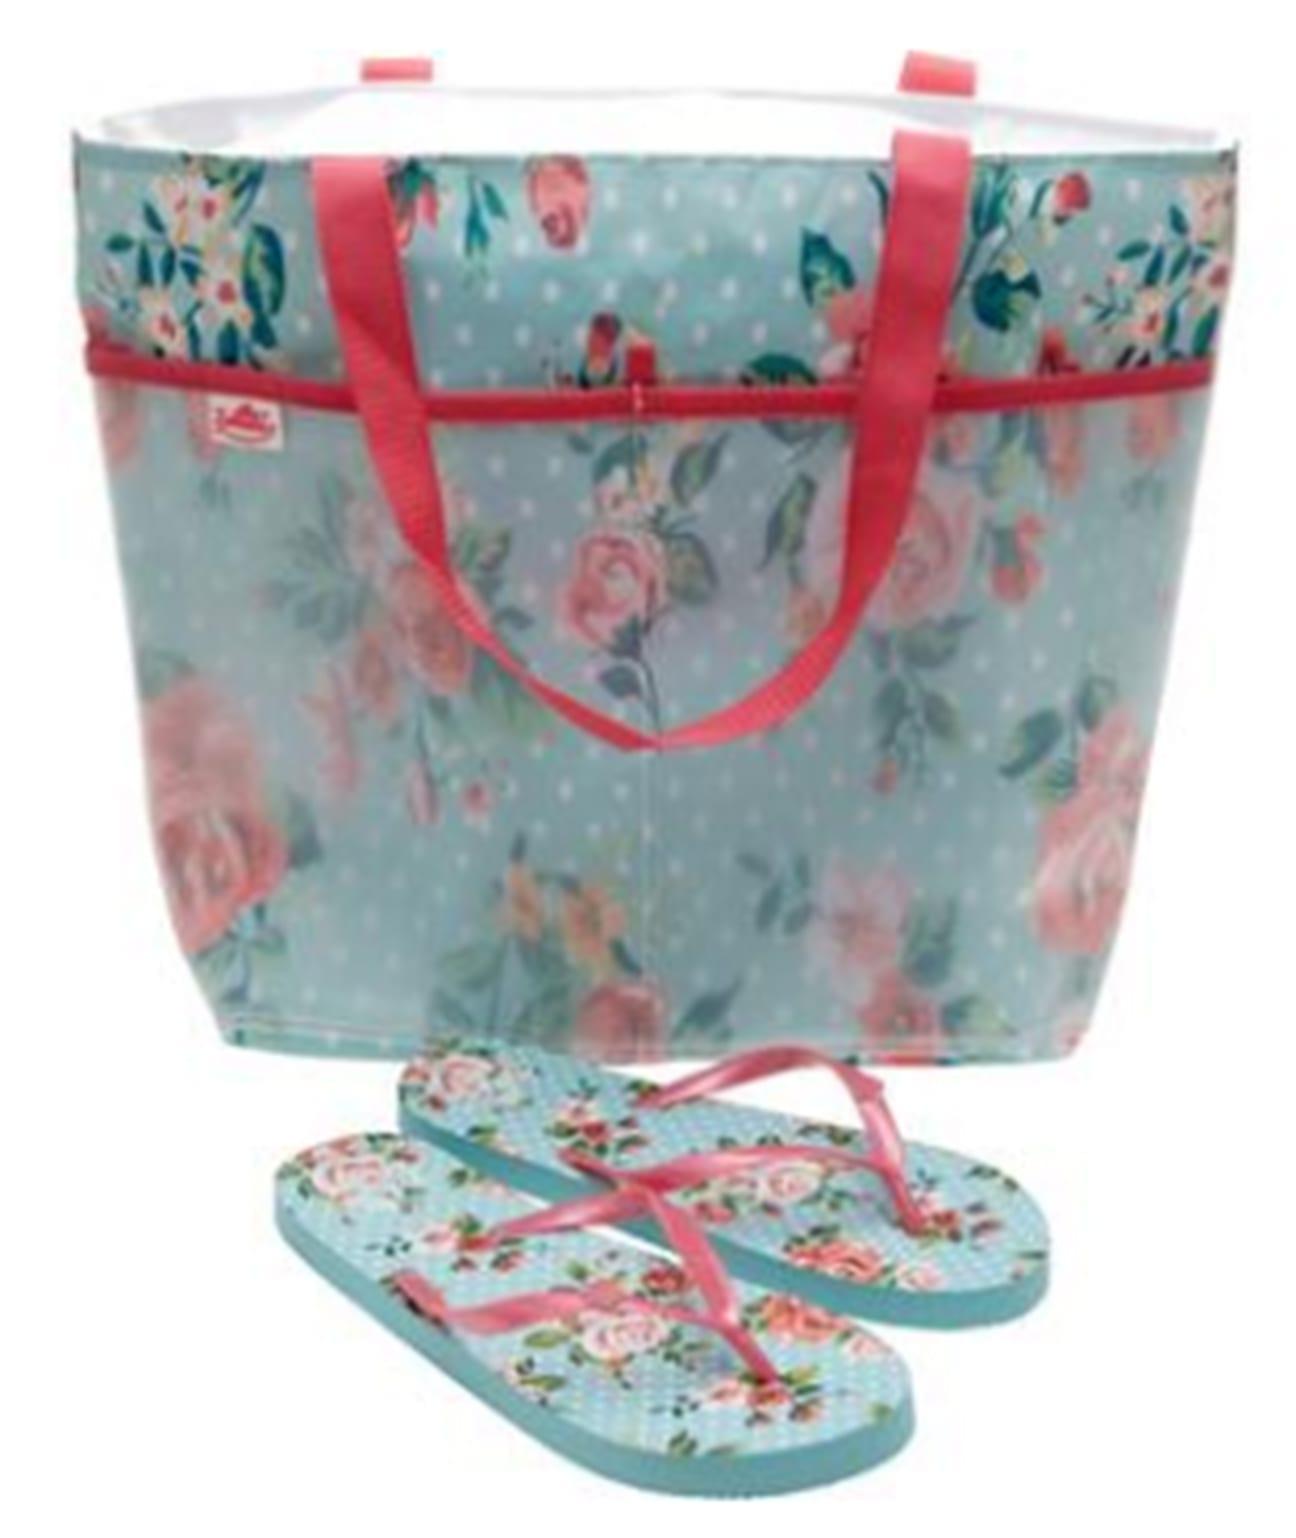 Zohula Summer Rose Beach Bag Matching Flip Flops